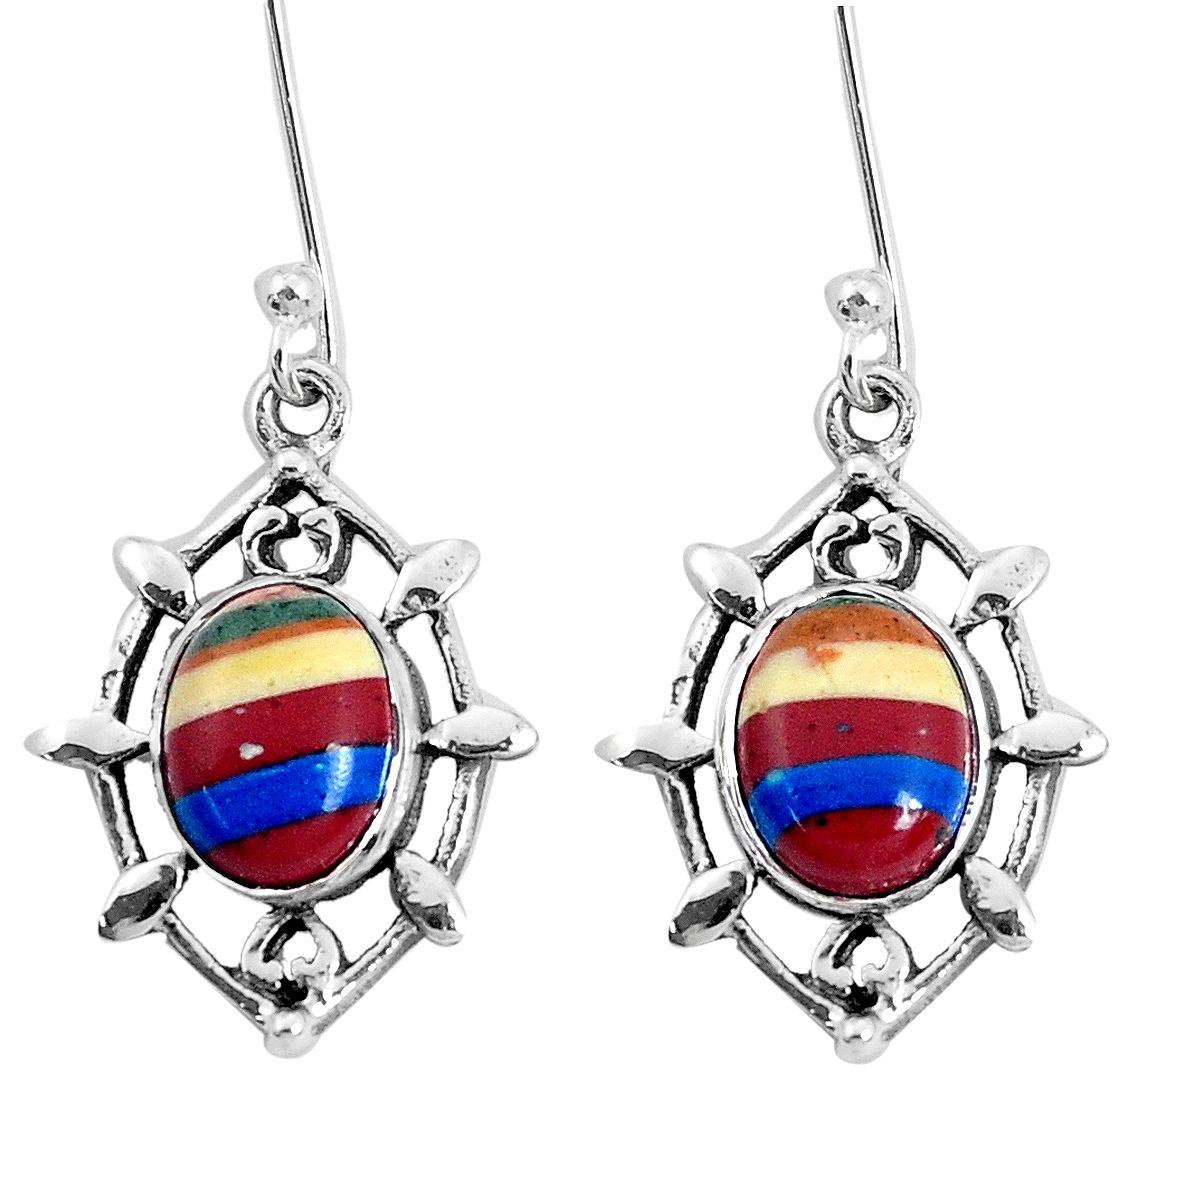 Rainbow Calsilica Cabochon loose gemstone Amazing Smooth Rare Healing Natural stripes of vibrant colors Stone Q204